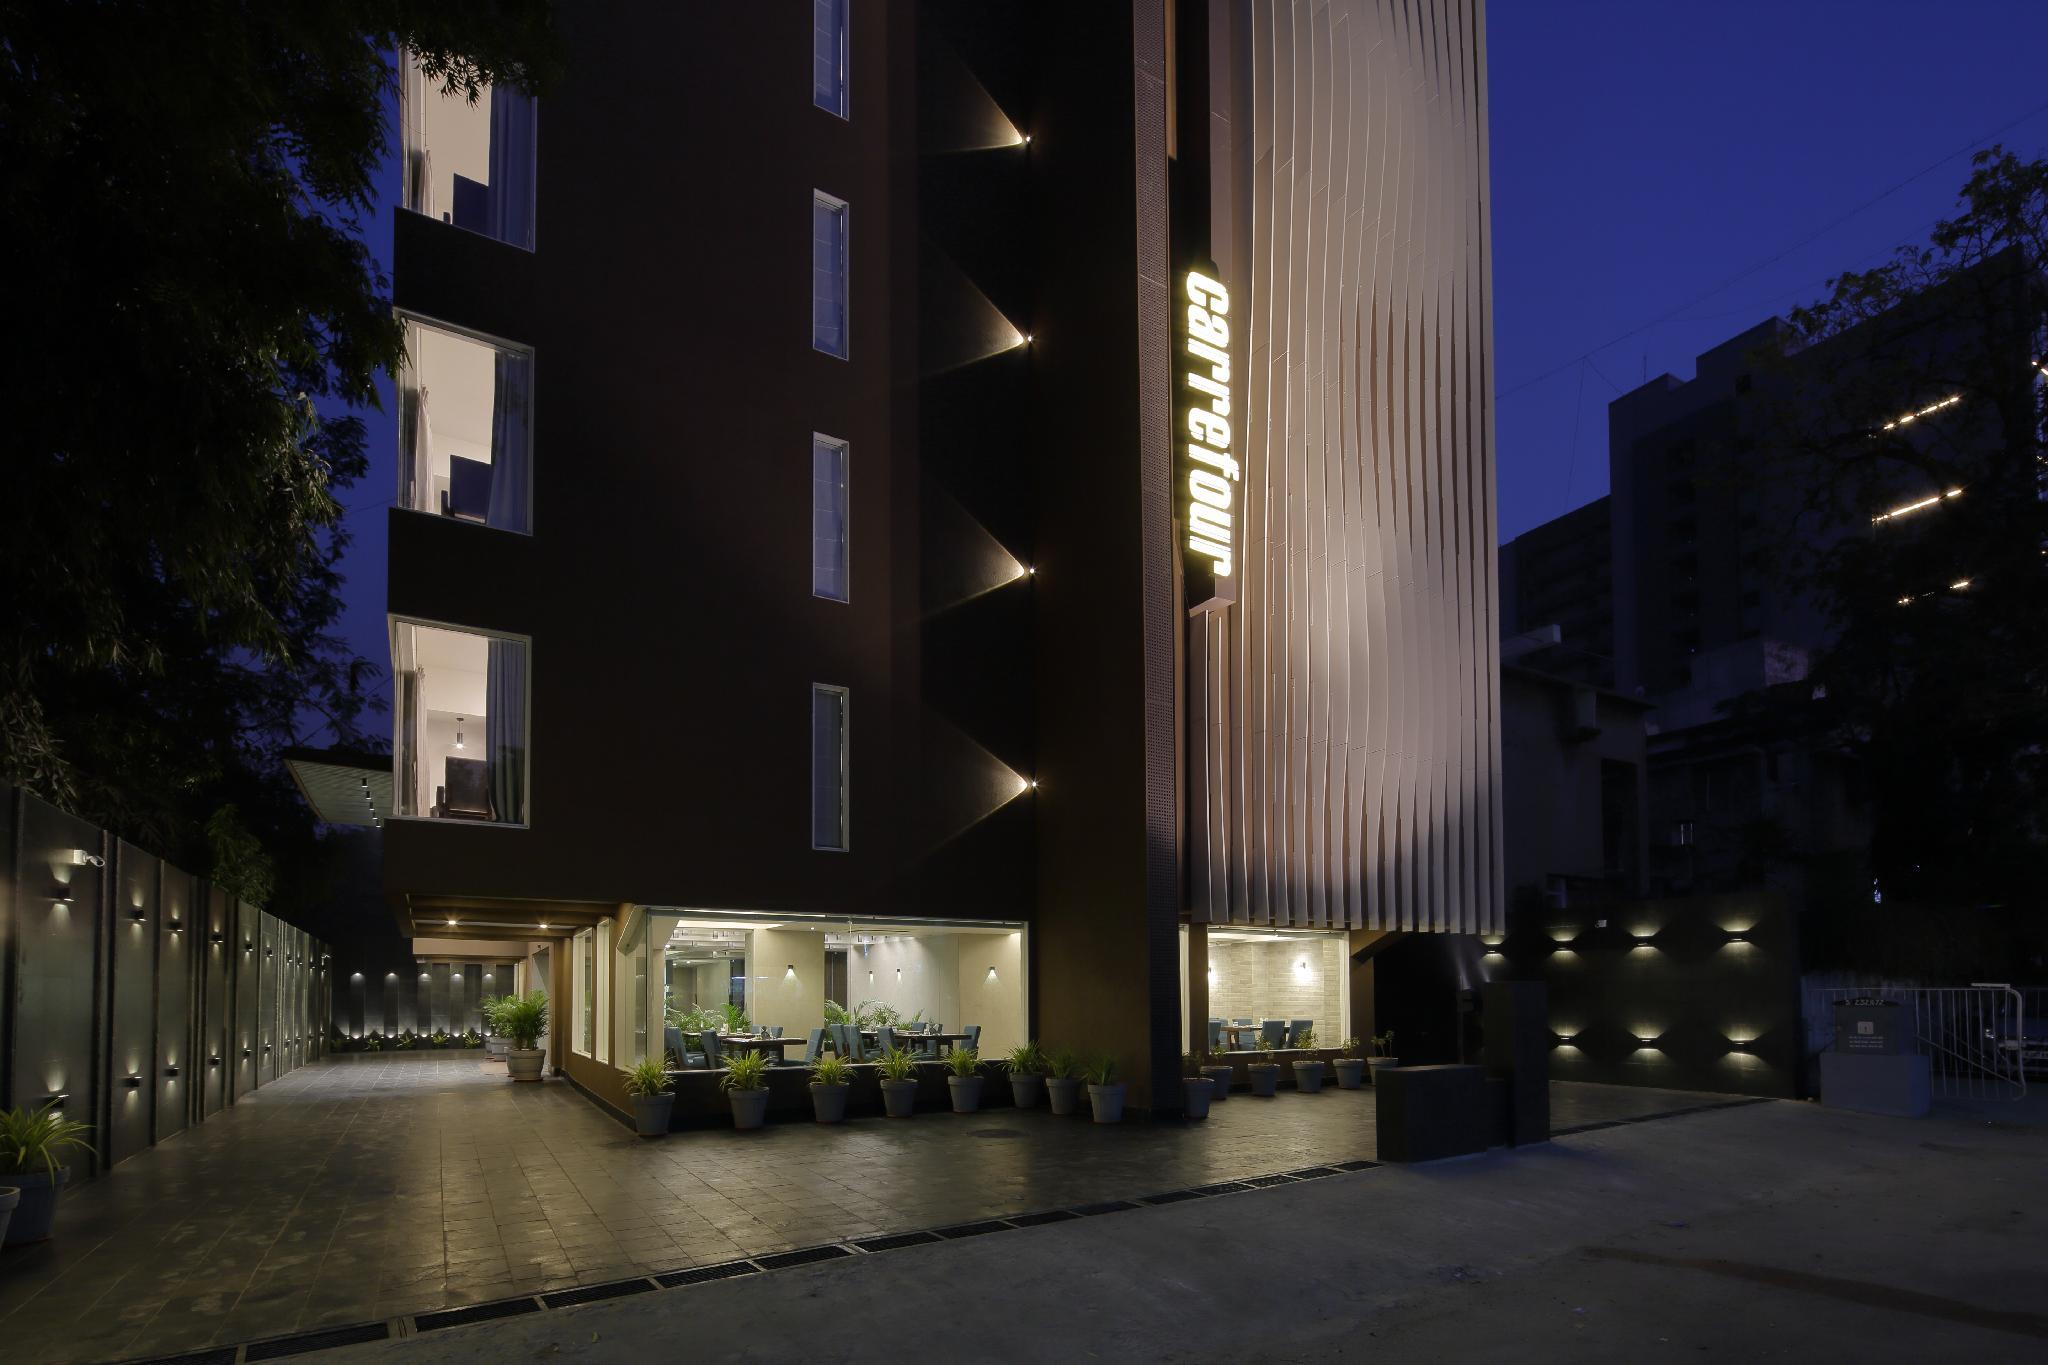 Hotel Carrefour Ahmedabad India